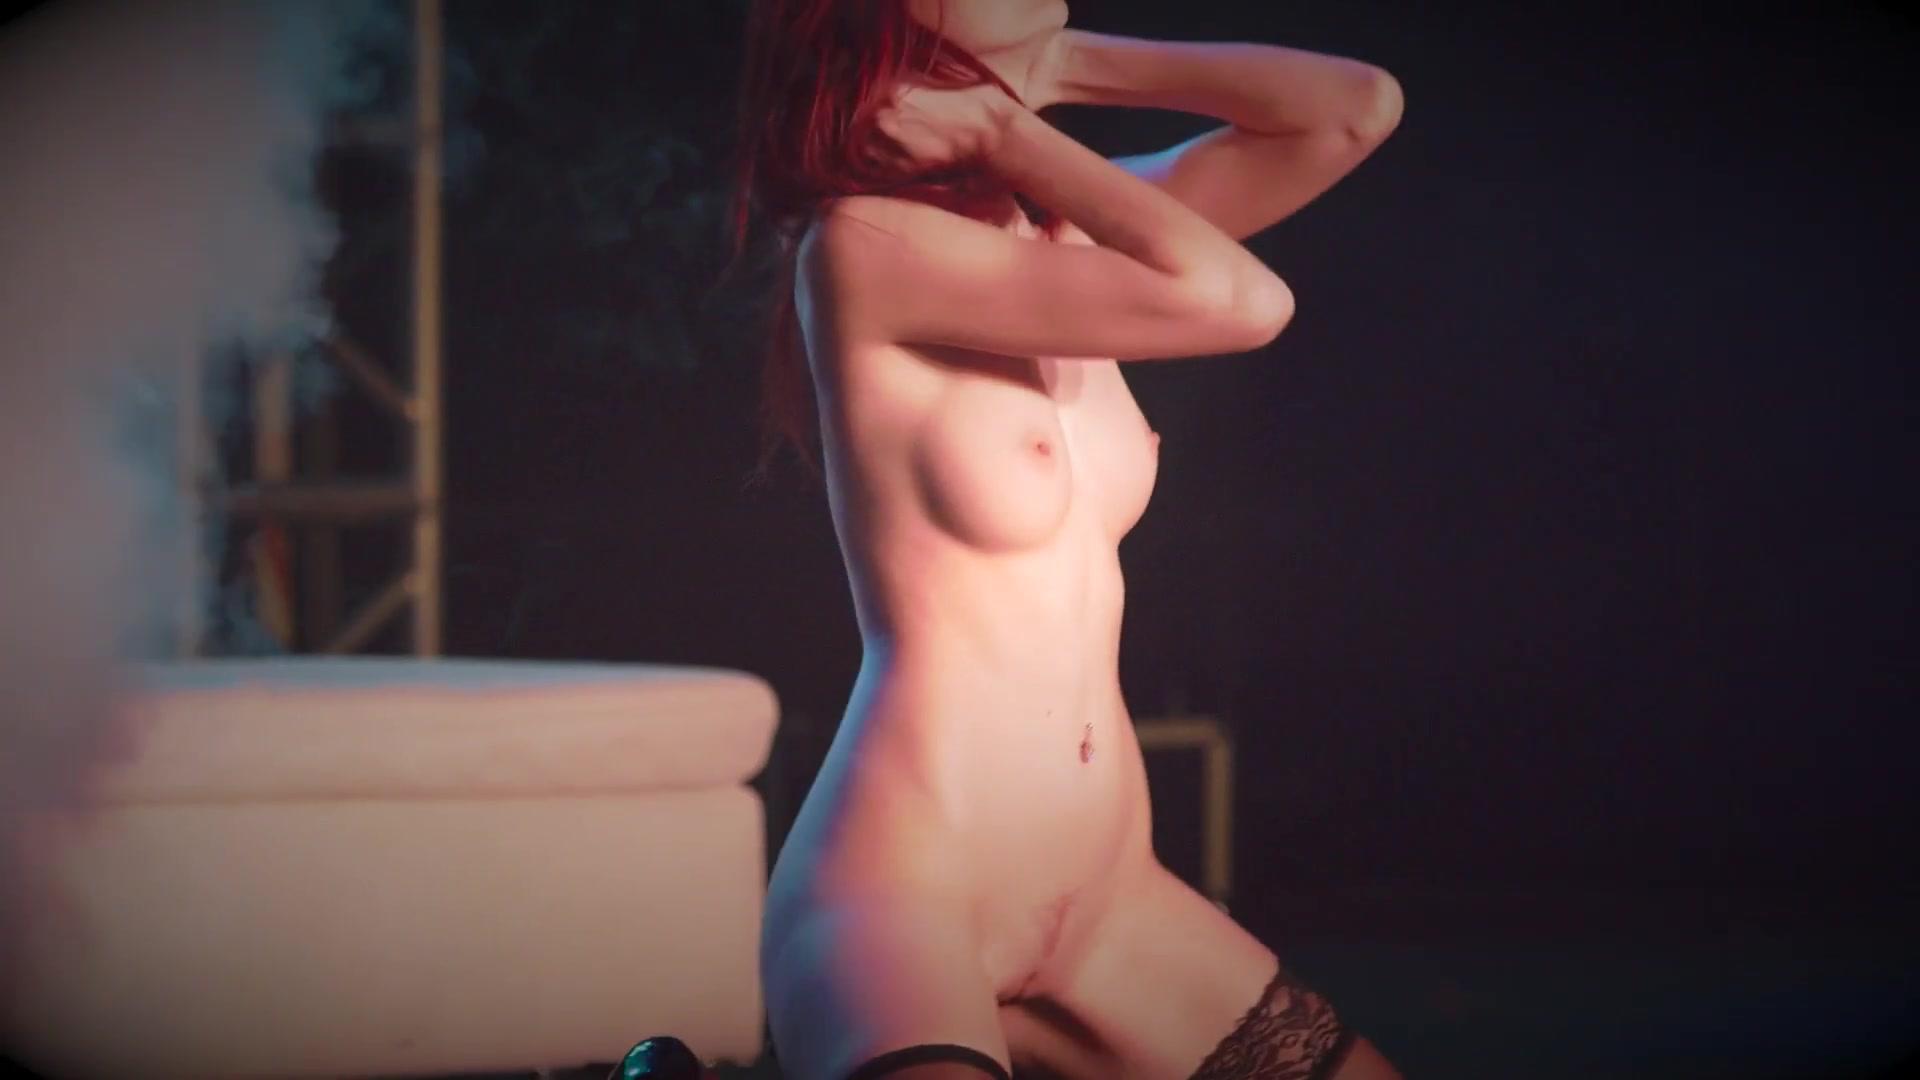 Loila Naked - Public Dance Performance  Nude Celebs Tube-1385